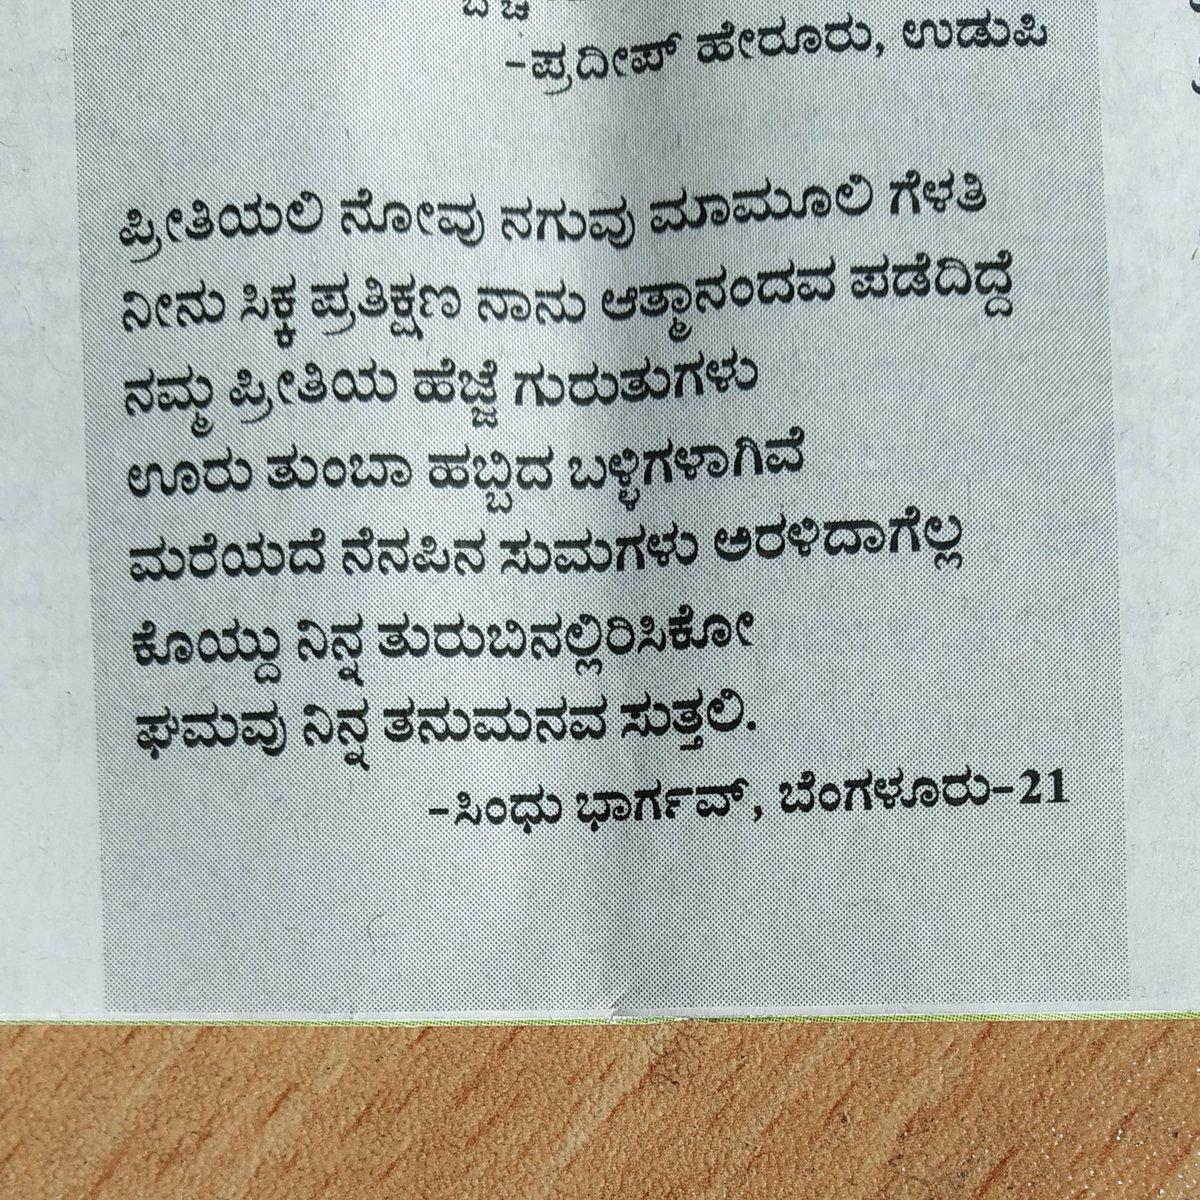 "#Nimmellara_Manasa #ನಿಮ್ಮೆಲ್ಲರ_ಮಾನಸ #ಮ್ಯಾಗಜೀನ್ ಲಿ ನಾನು ಬರೆದ ಹನಿಗವನ ""ಮನದ ಮೆಸೇಜ್ "" ನಲ್ಲಿ ಪ್ರಕಟವಾಗಿದೆ. ಸಂಪಾದಕ ಬಳಗಕ್ಕೆ ವಂದನೆಗಳು💐 #monthlymagazine #kannadaquotes #lovequotes #kannadaarticle #kannadapoetry #kannadastories #Sindhubhargavquotes #februarymonth of article"